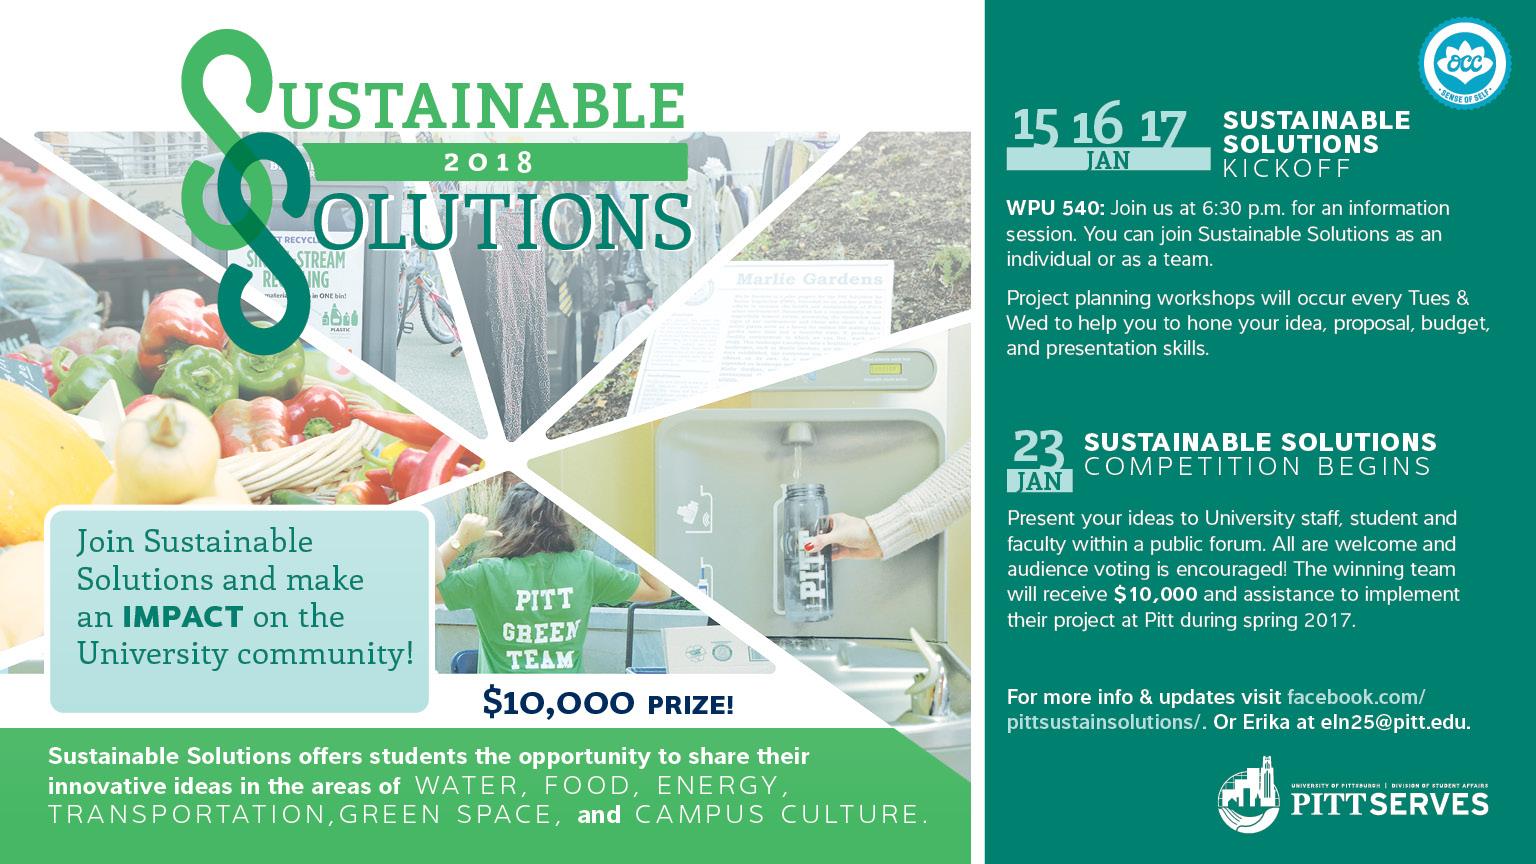 SustainableSolutions_General_tvslide_Jan 23